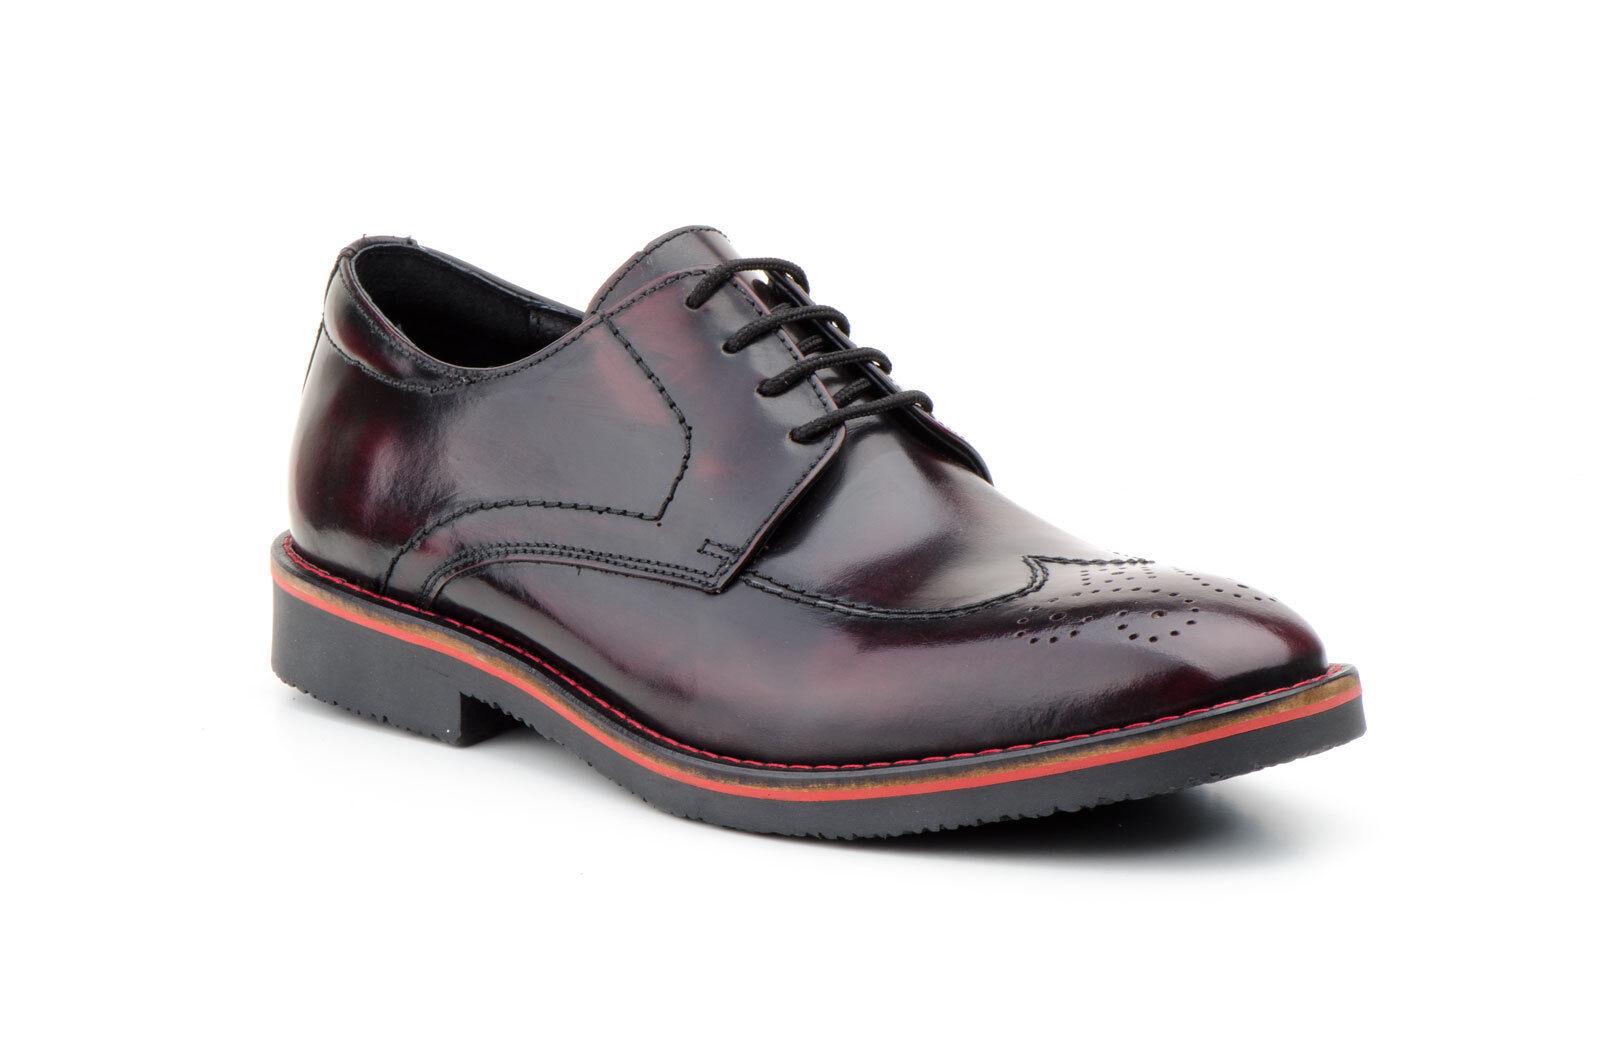 Schuhe Blücher Pelz Patent für Mann Bordeaux Größe 39 40 41 42 43 44 45